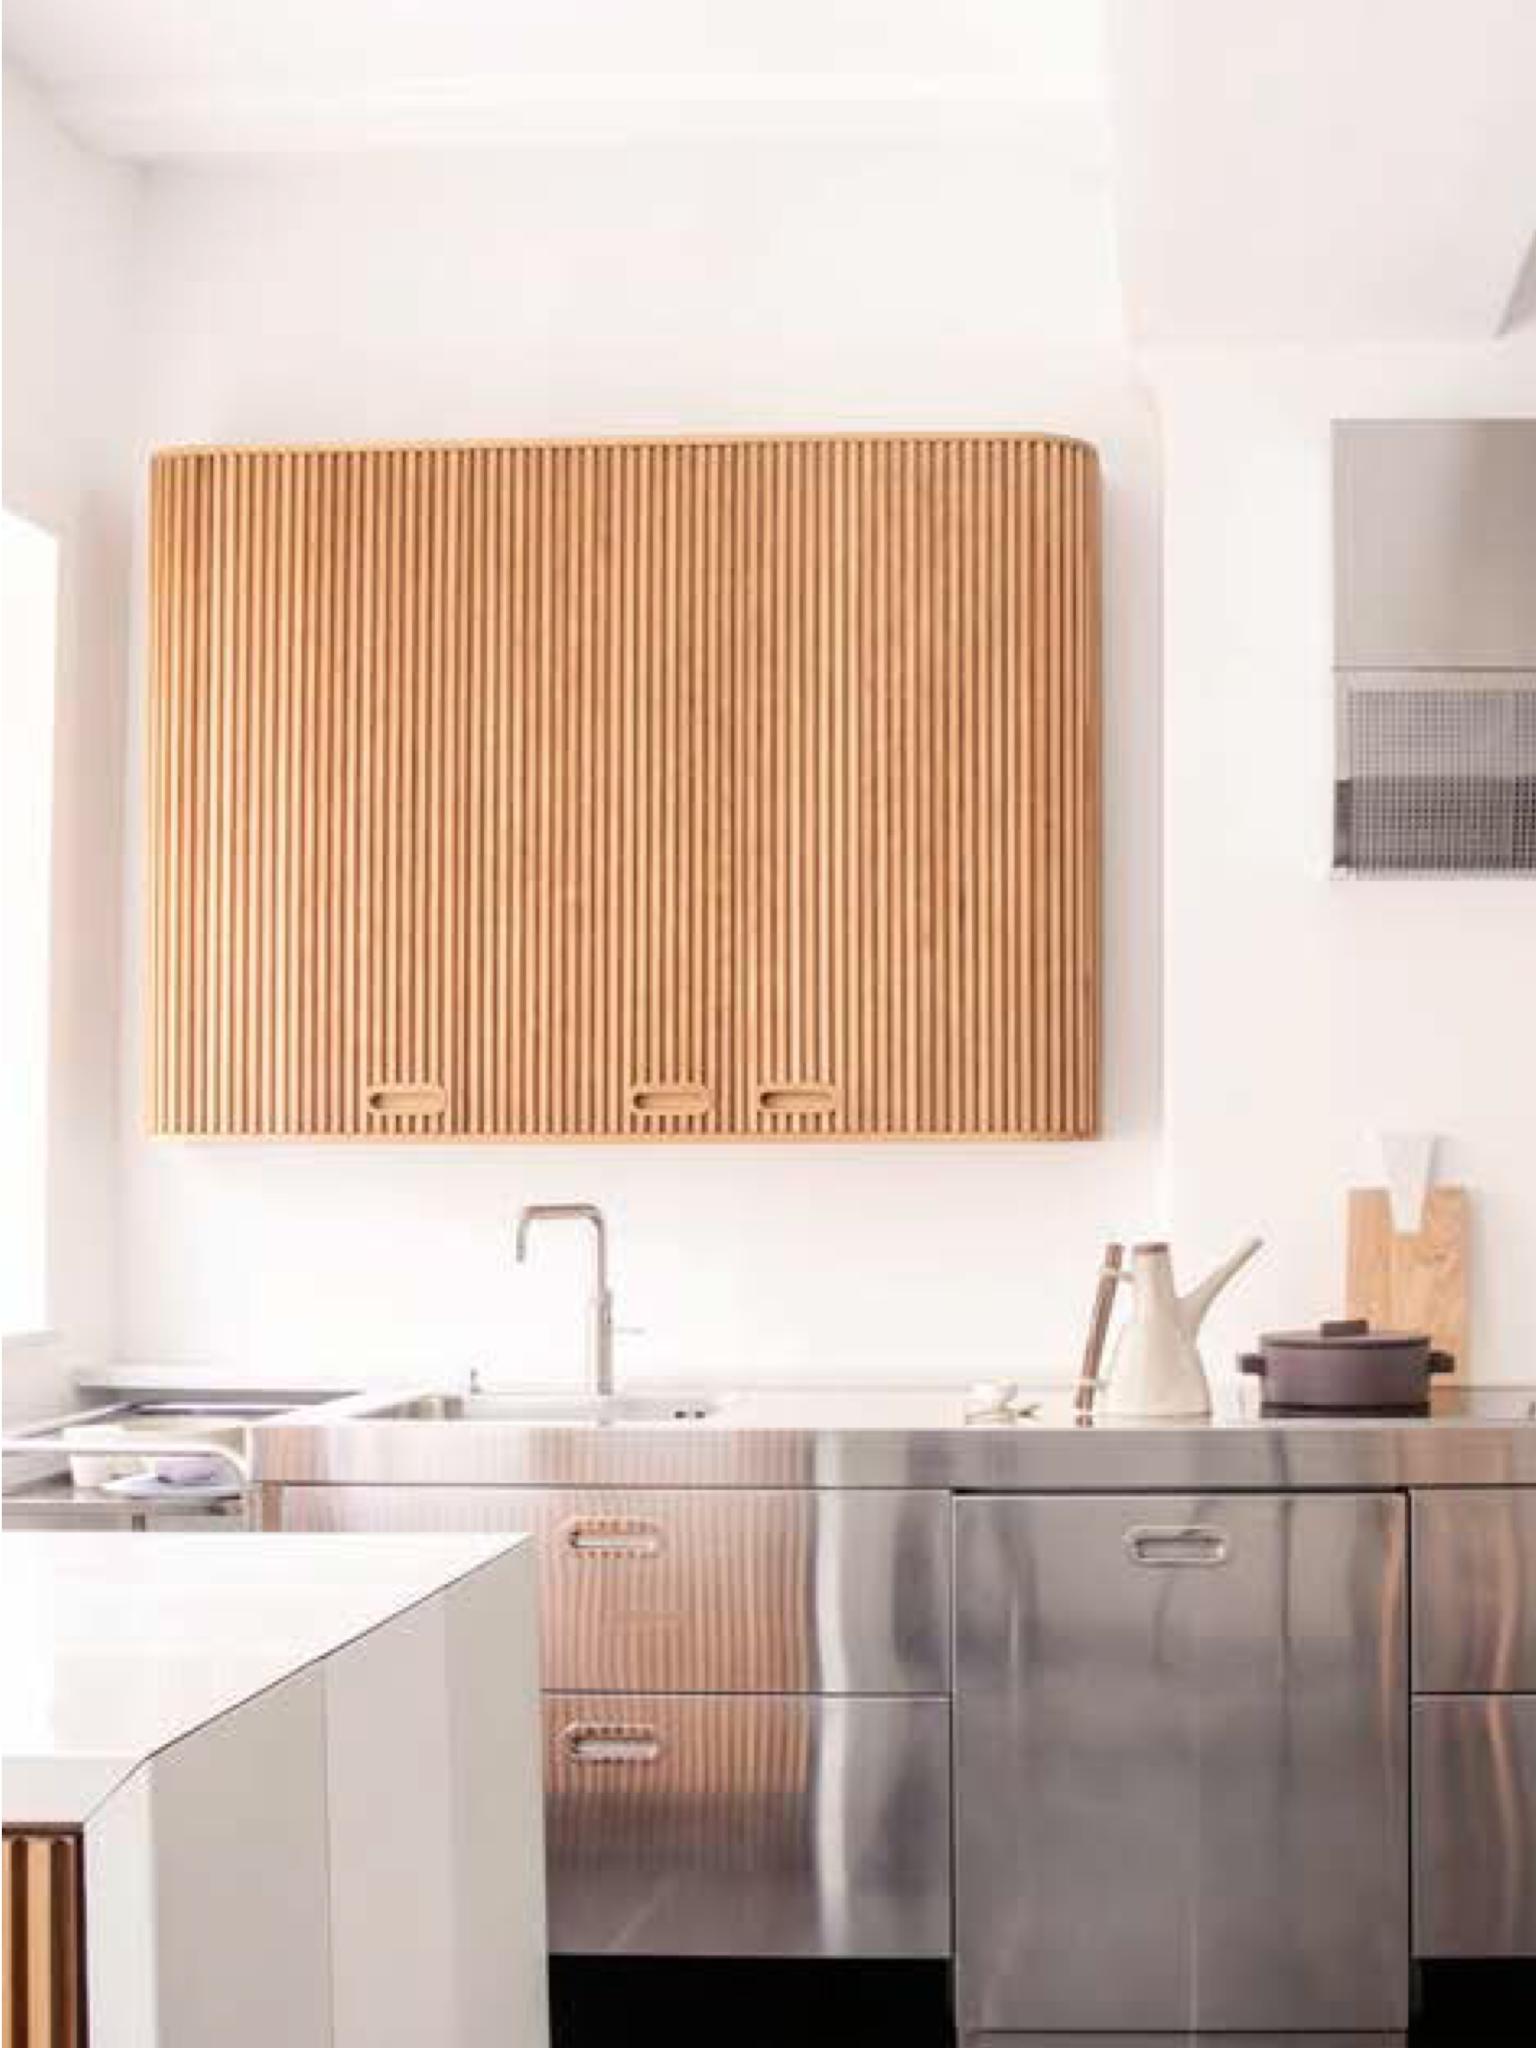 32 Incredible Farmhouse Kitchen Cabinet Ideas Waking Up The World Kitchen Cabinet Design Kitchen Renovation Kitchen Decor